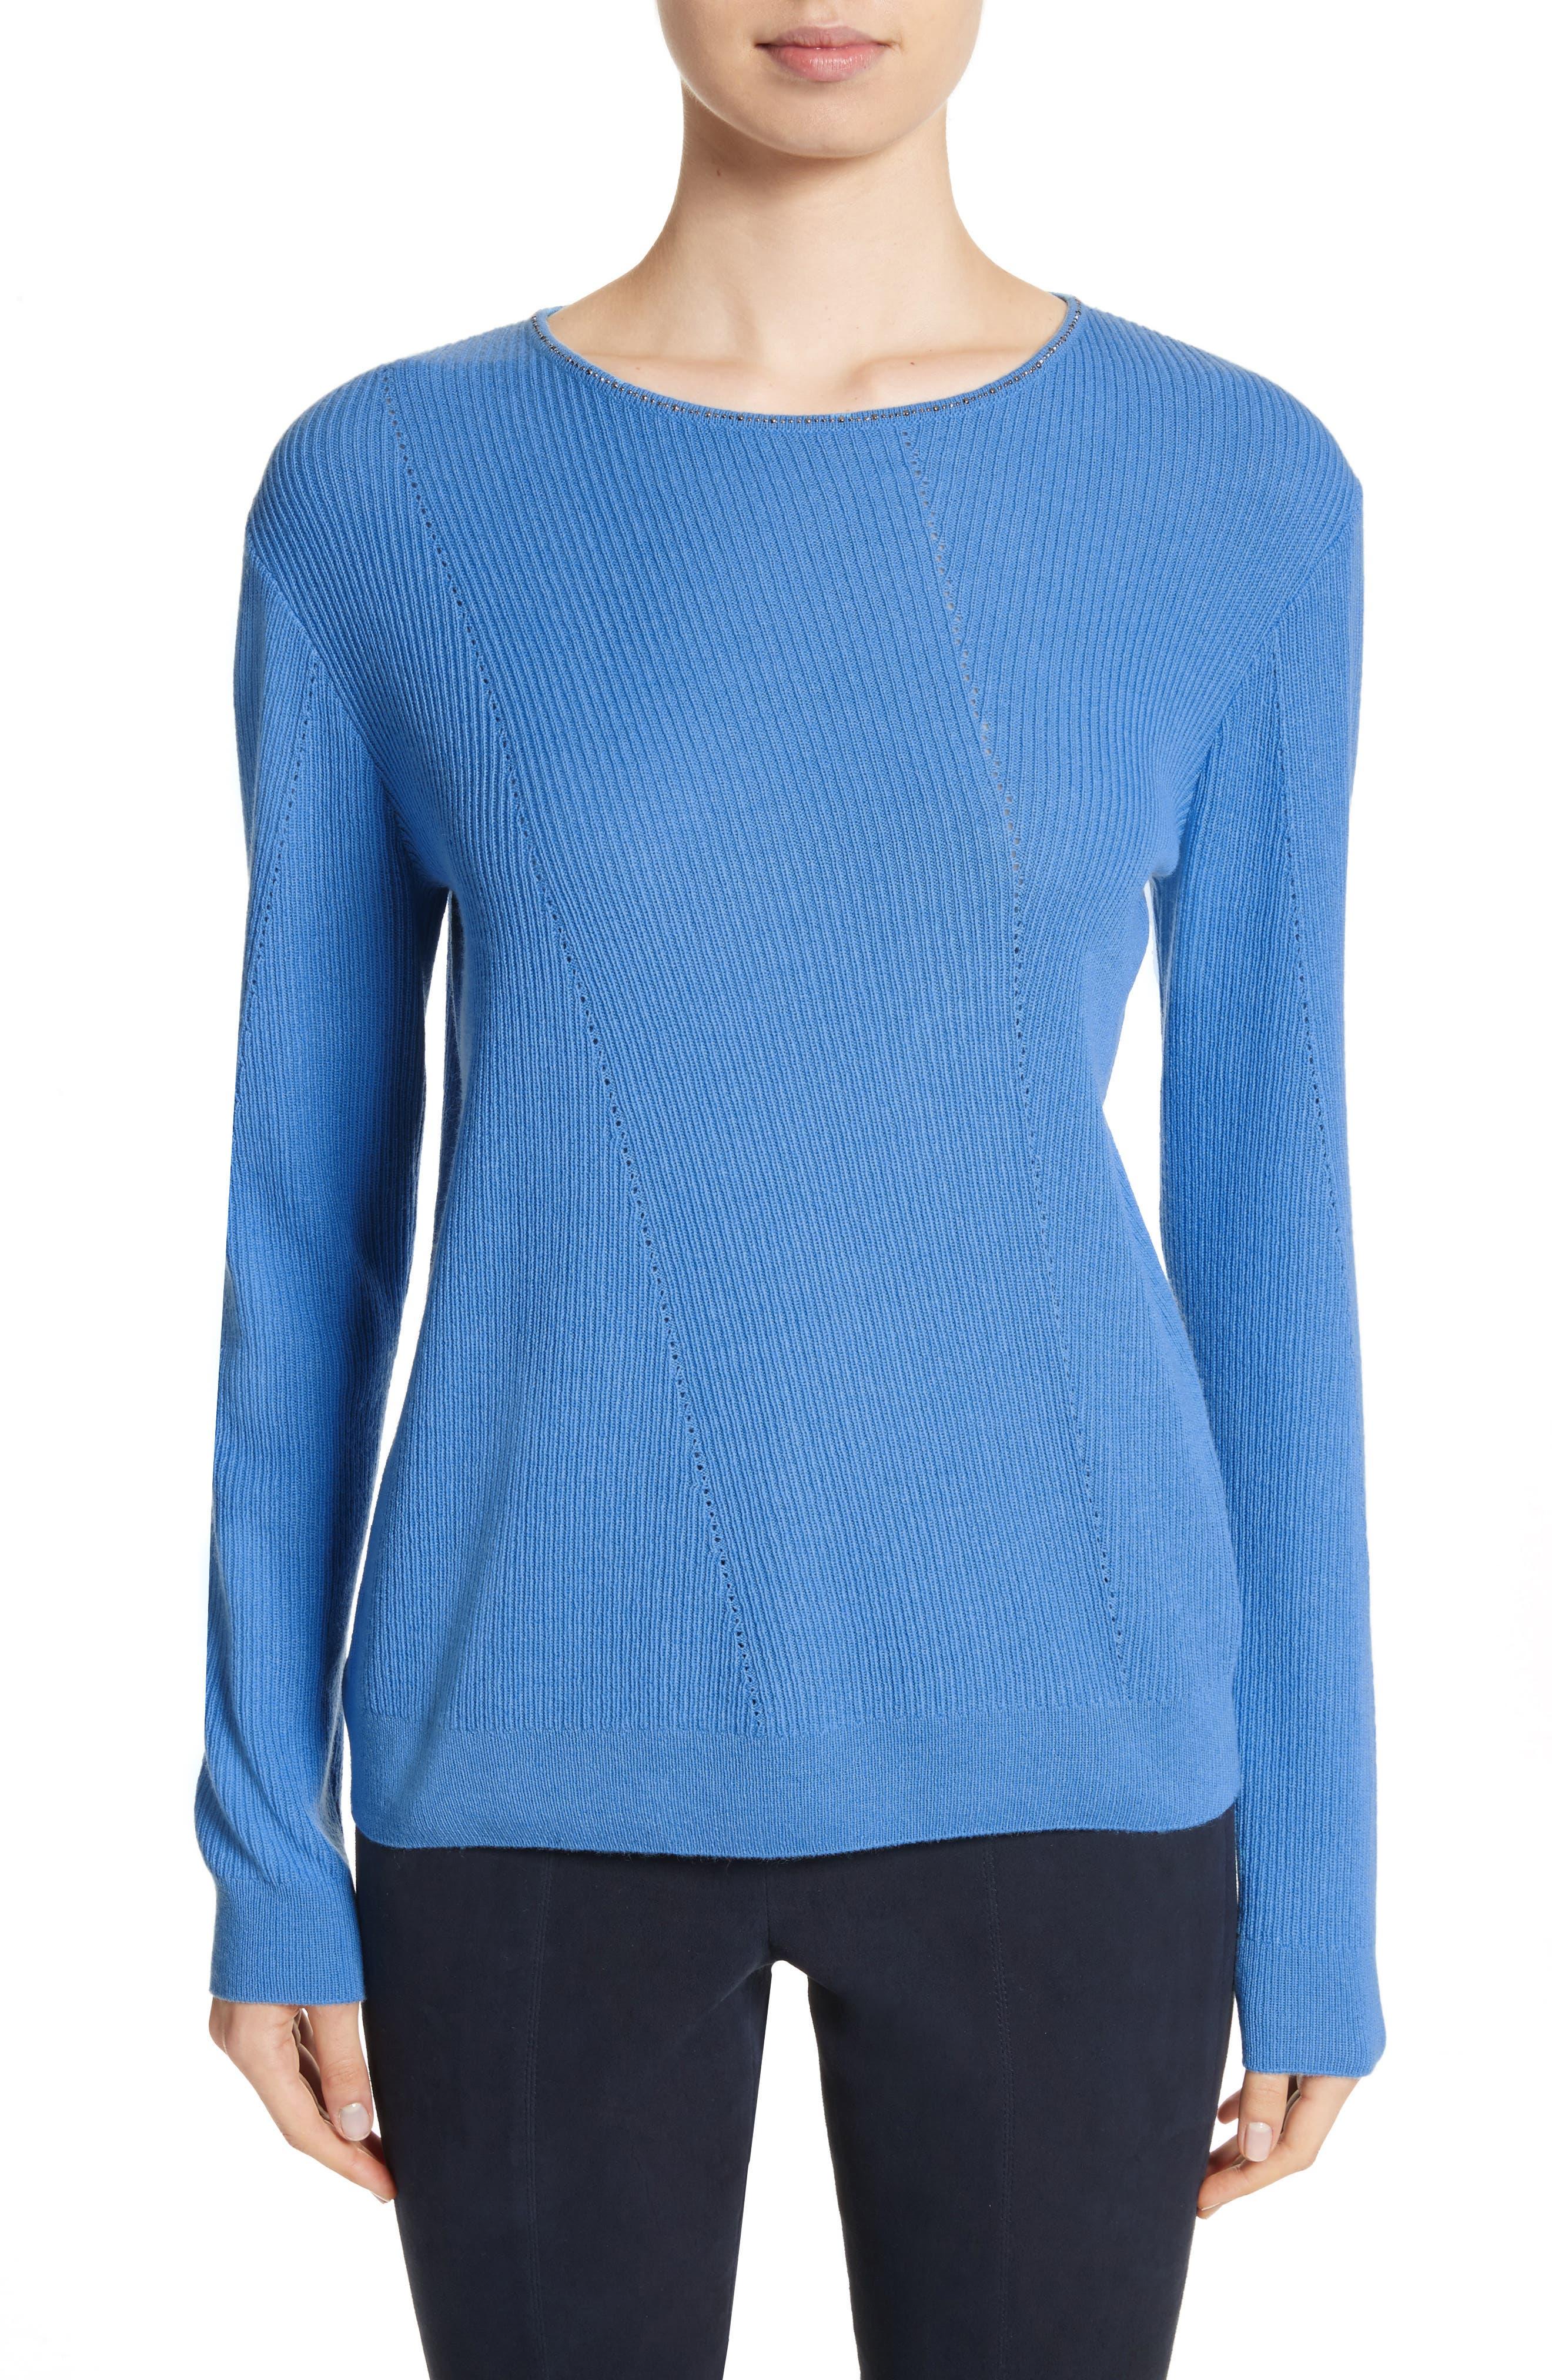 Cashmere Sweater,                             Main thumbnail 1, color,                             420